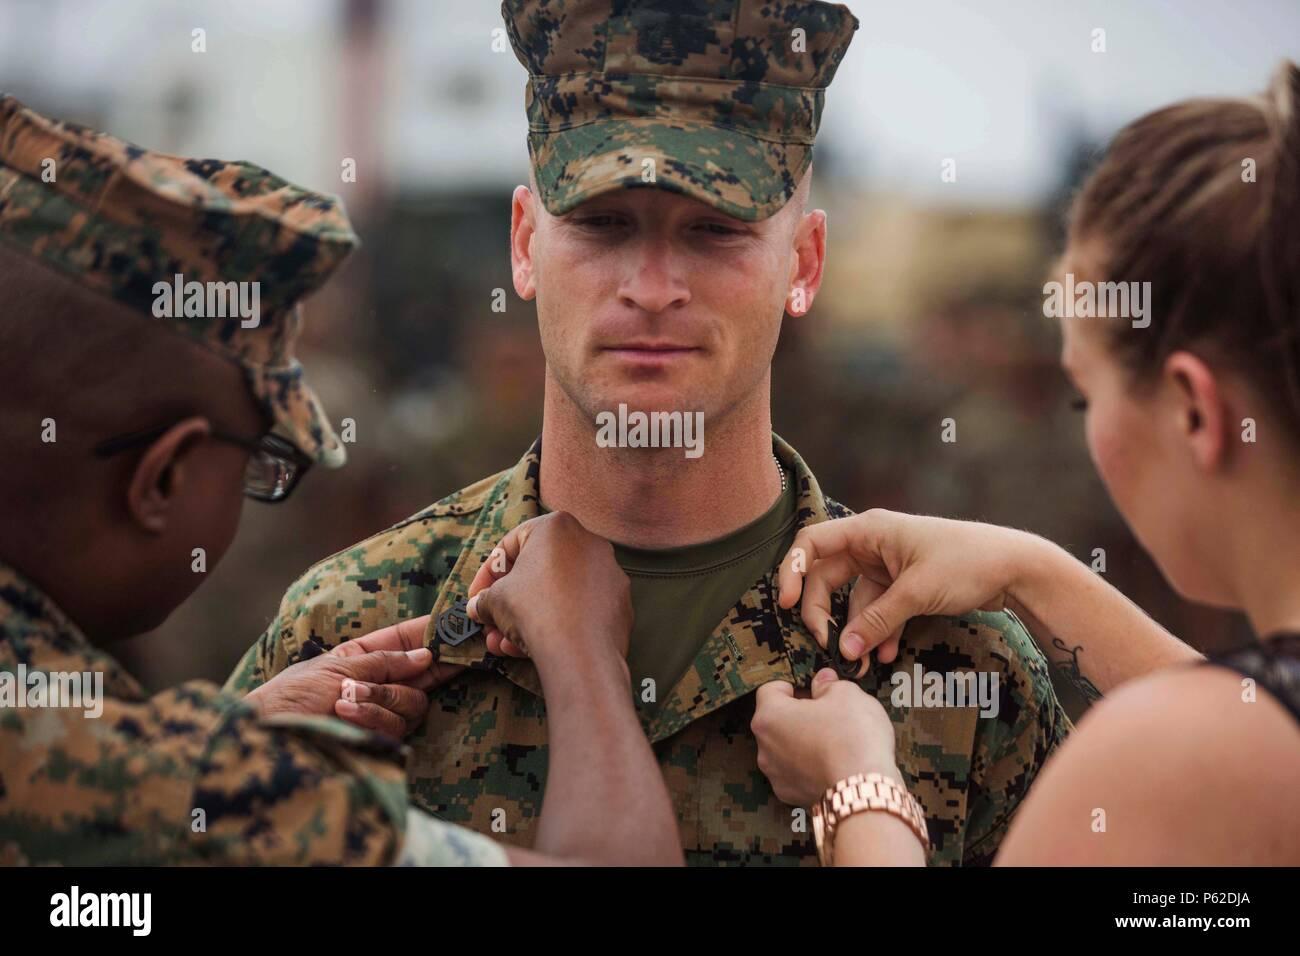 Gunnery Sergeant Stock Photos & Gunnery Sergeant Stock